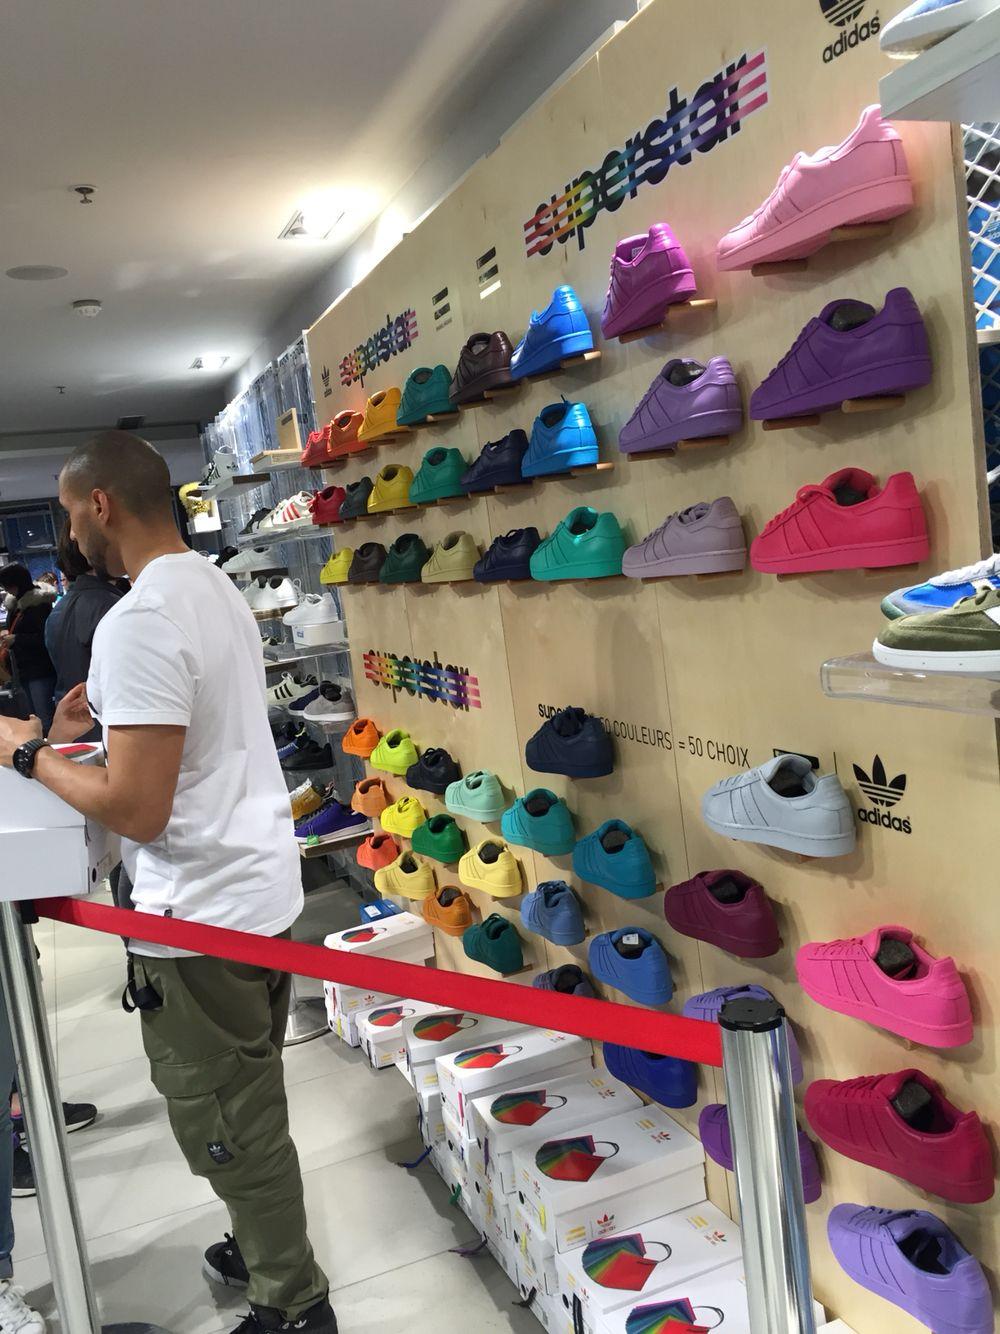 Adidas Superstar Adidas store 22 avenue